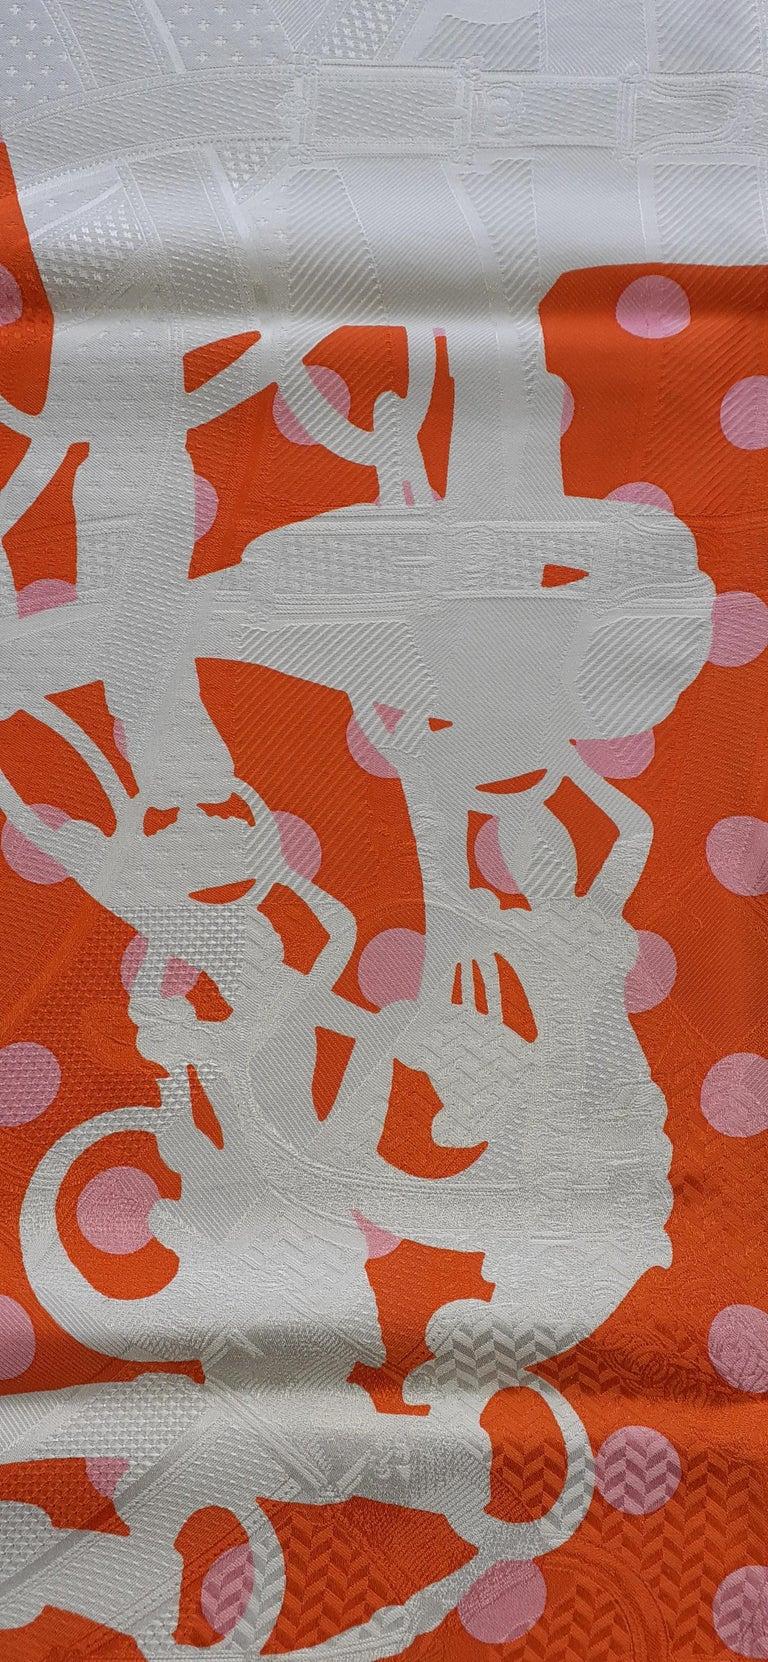 Hermès Silk Scarf Cavalcadour Brides de Gala A Pois Origny Orange Pink 90 cm For Sale 2